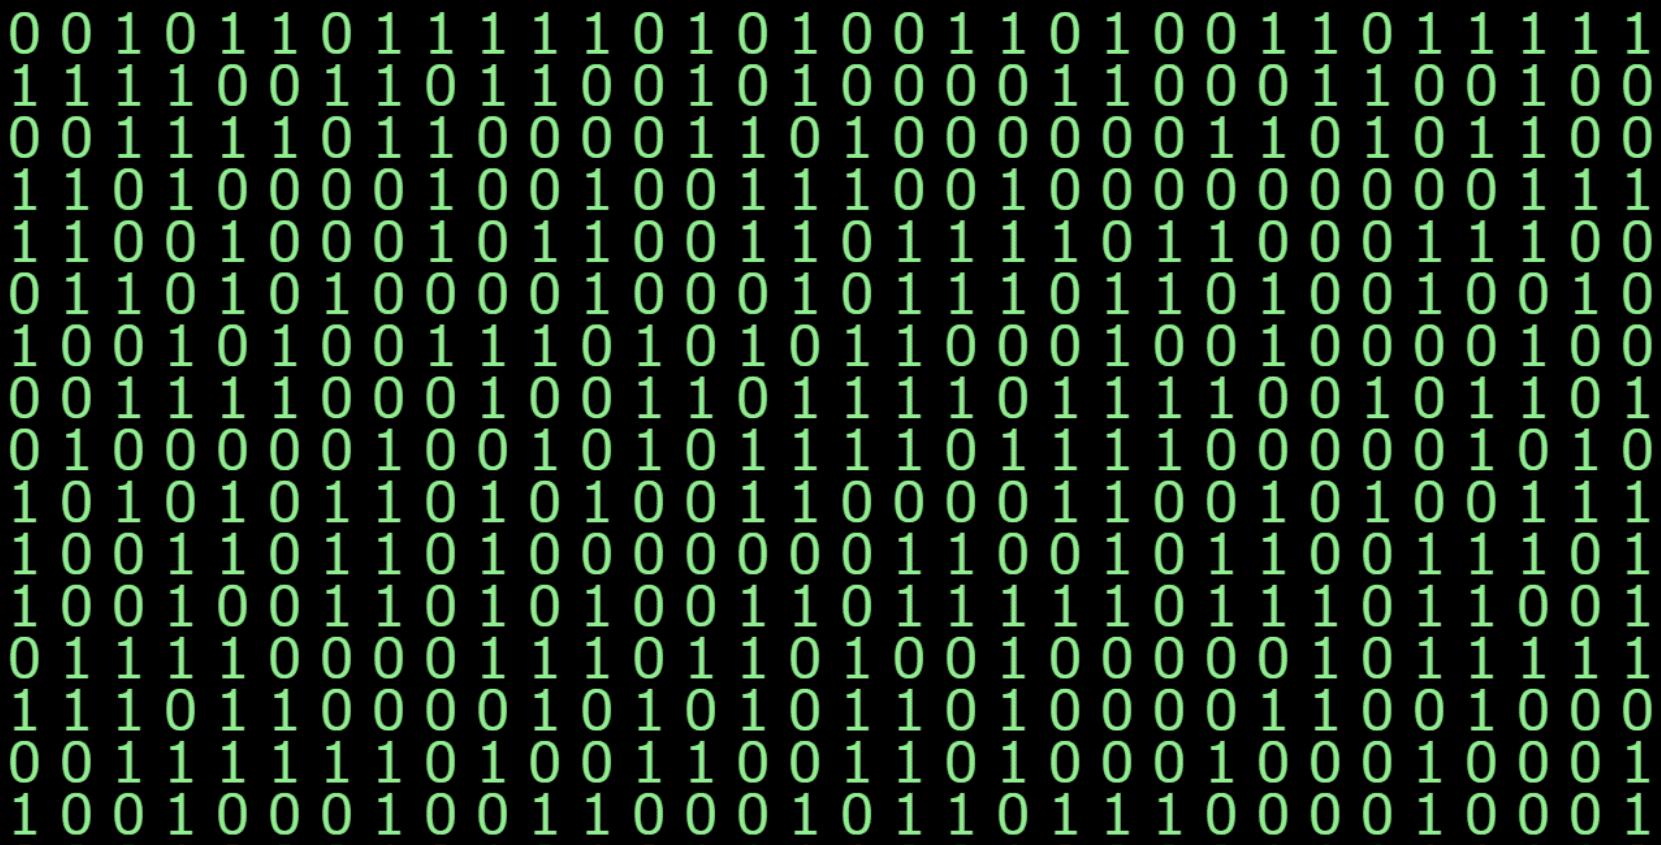 [C, C++学習]C, C++言語再学習ノート-5日目- –再まとめ変数型、書式指定子、型サイズ修飾子、型符号修飾子、接尾子、型修飾子の宣言時の並べ方、ビット論理演算、ビットシフト